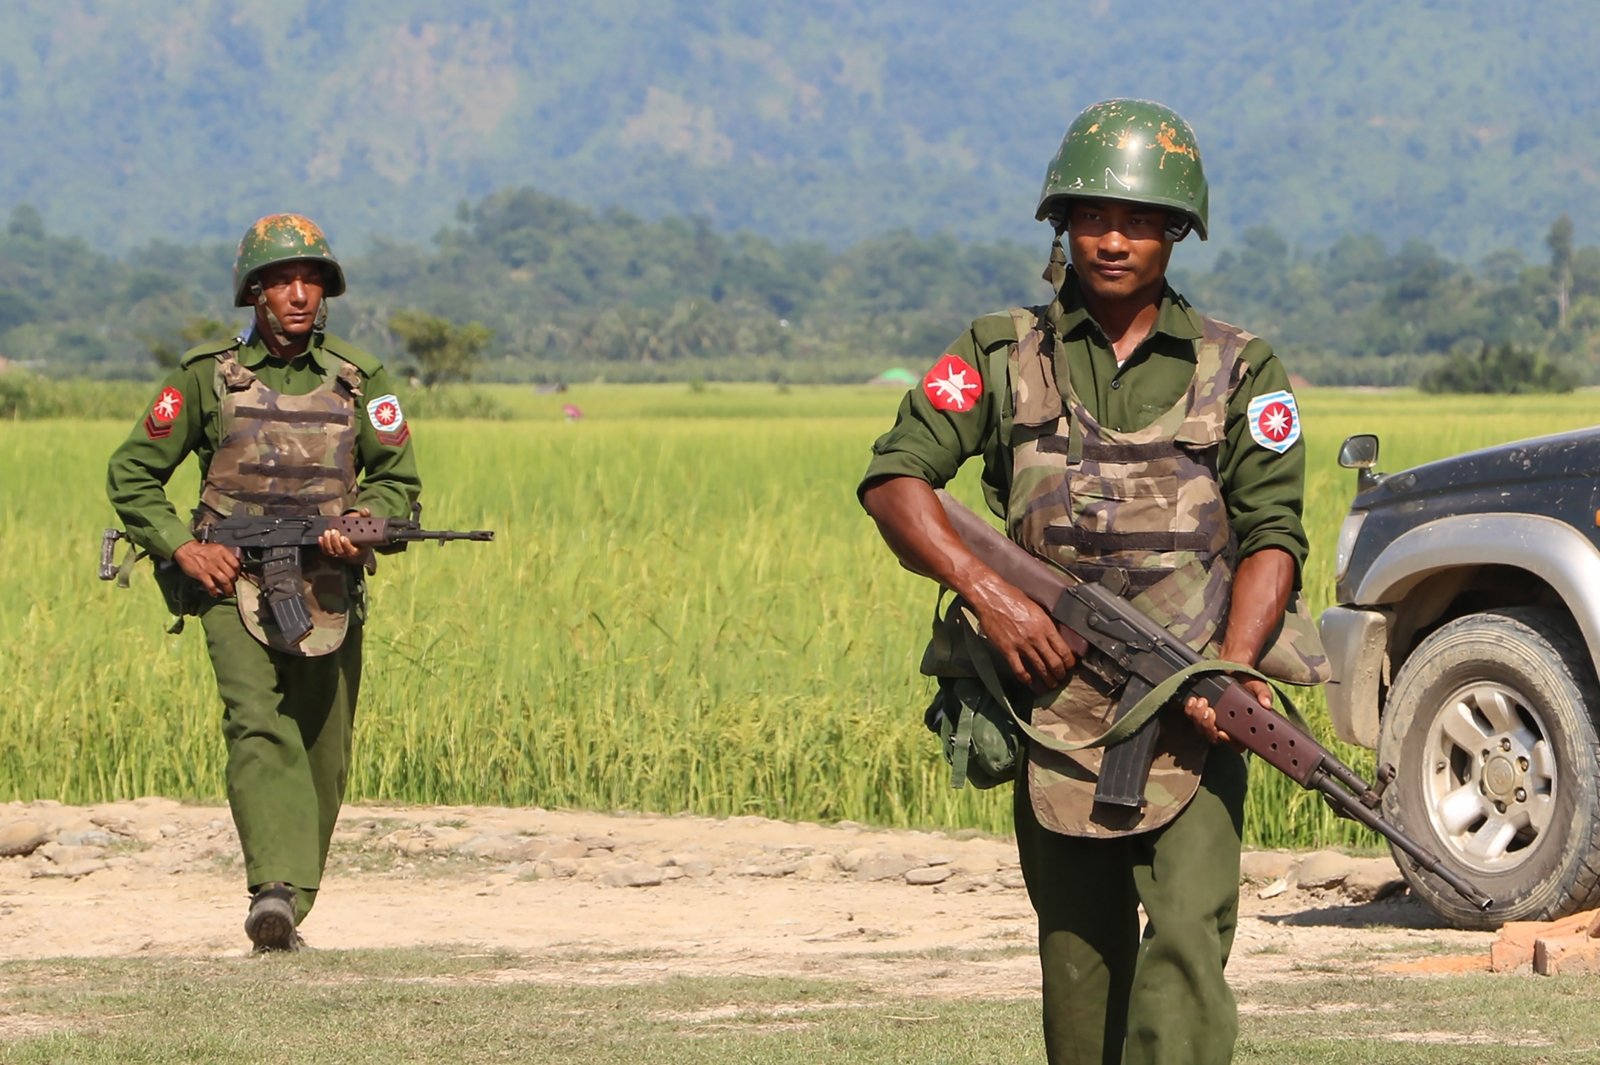 Myanmar: Satellite images show Muslim villages burned and